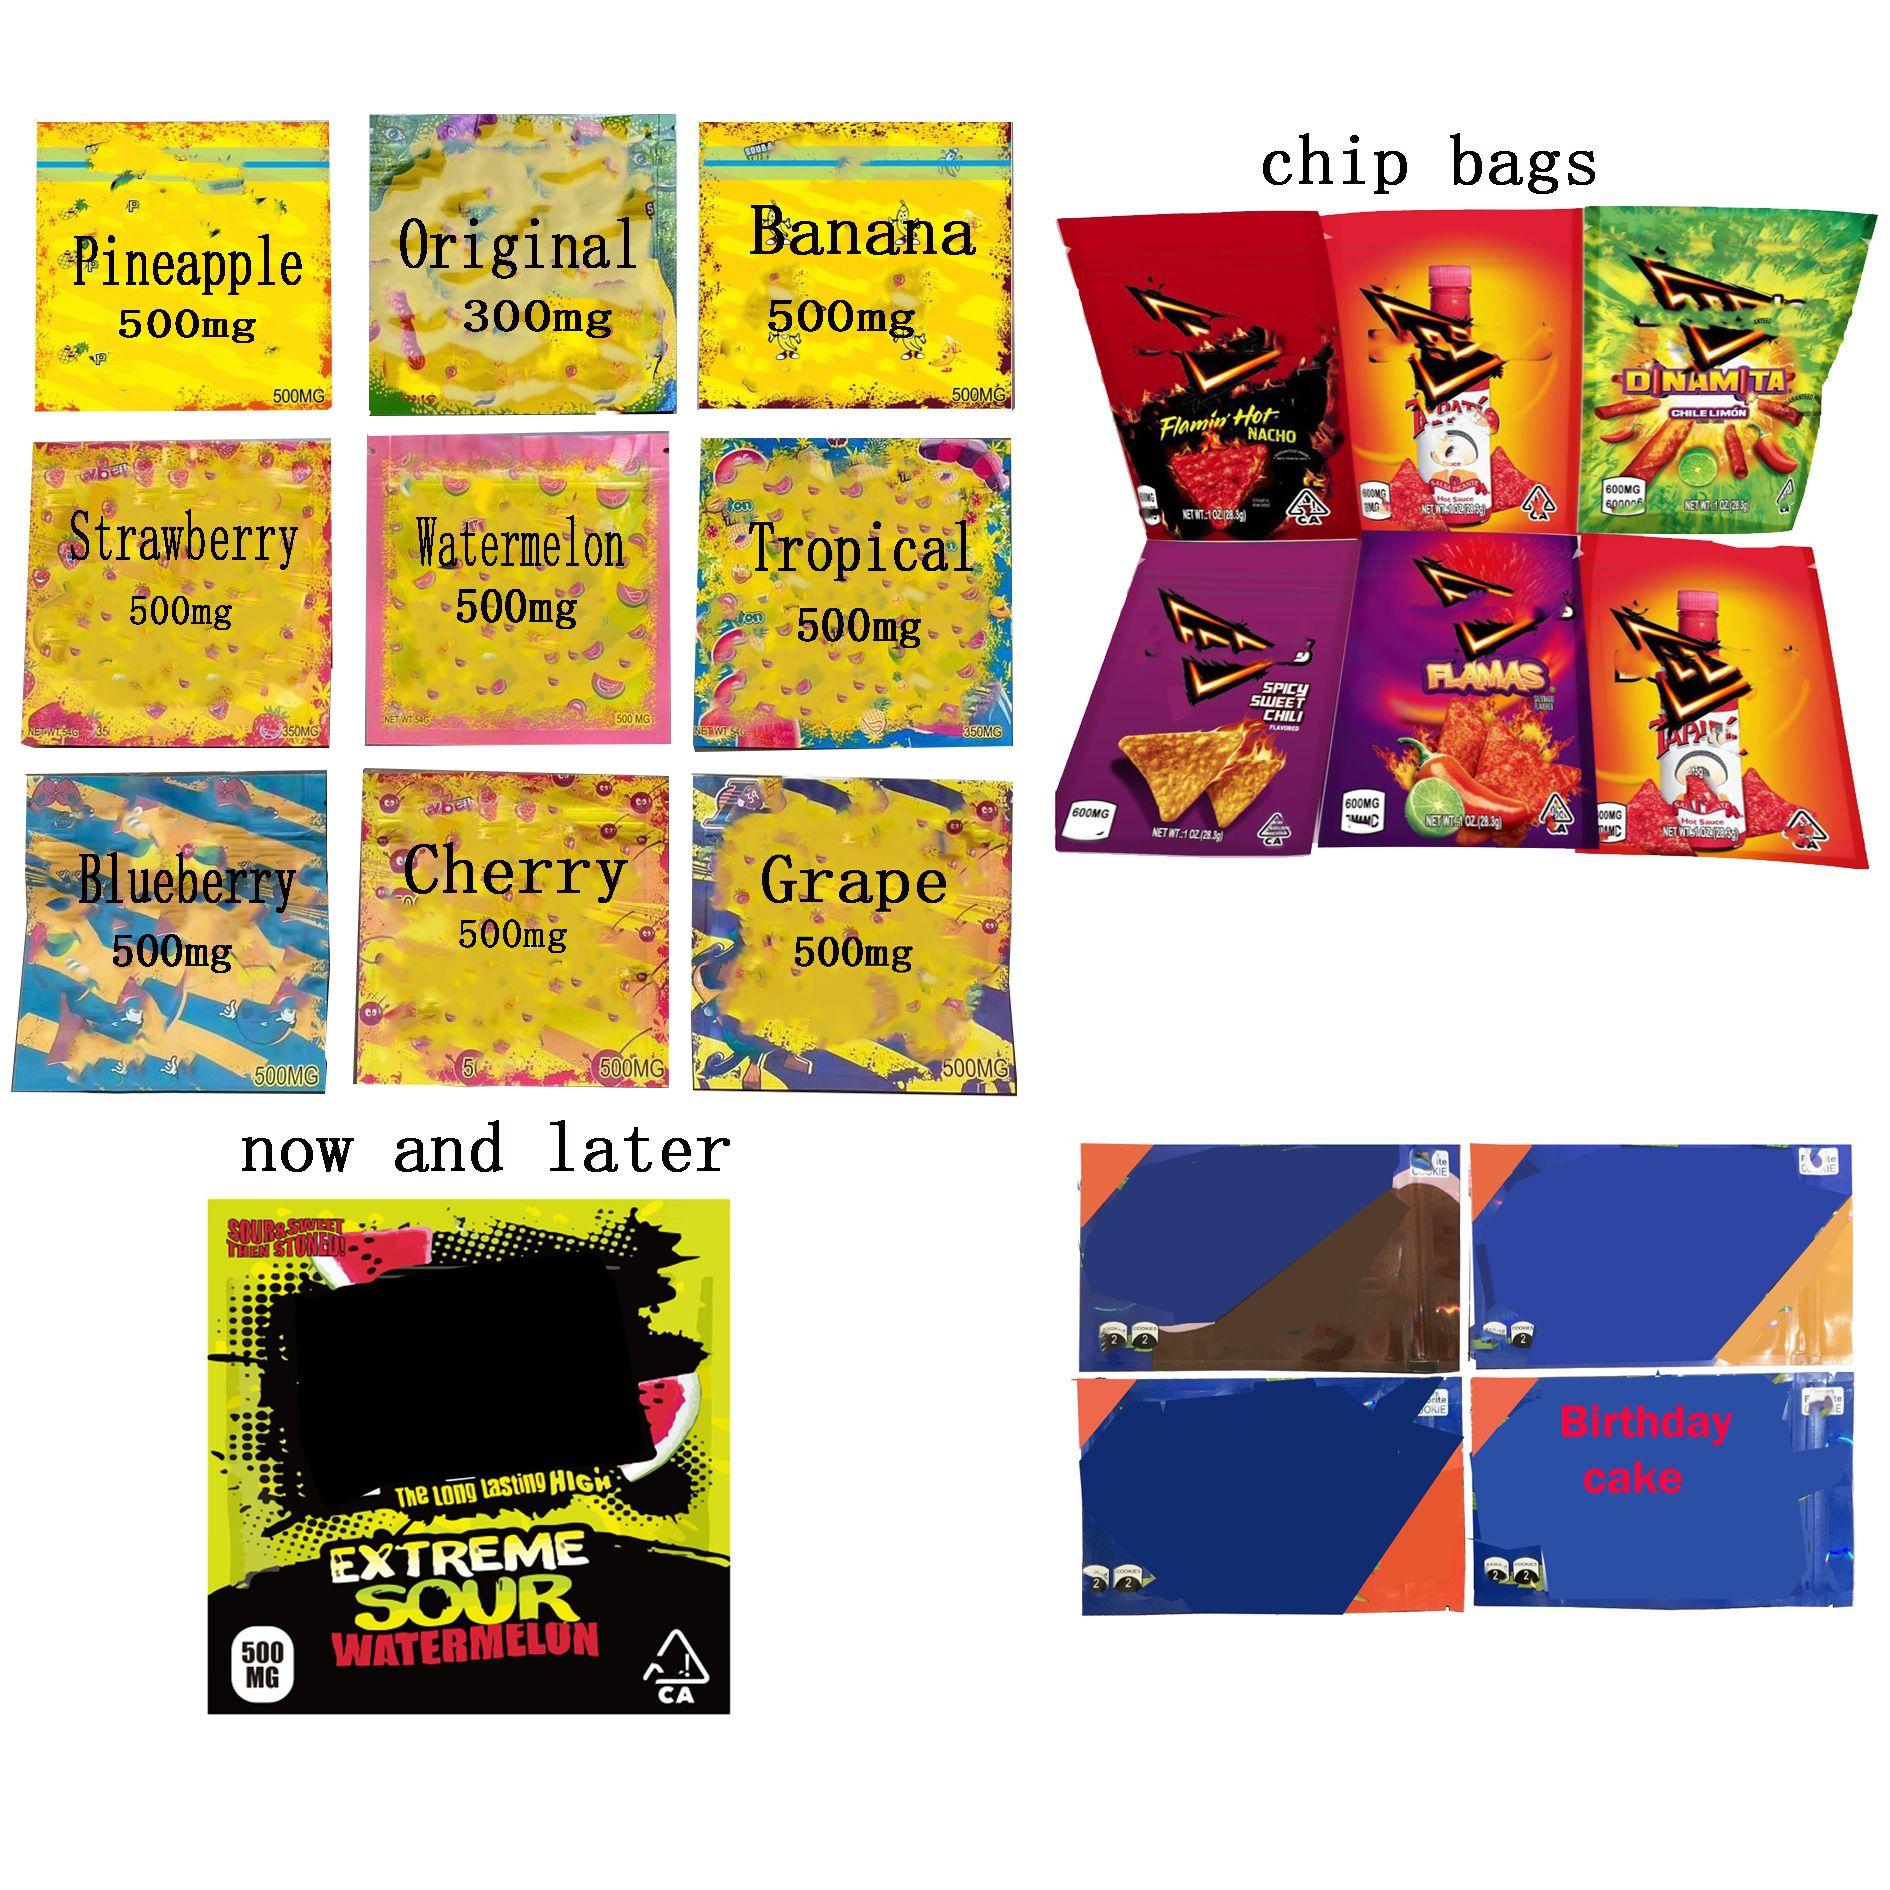 Vendita calda 500mg Doritos Doritos Chip Bag medicated 420 mg 400mg Corda Dank Gummies LOL Edibles Hashtag Svuoti Borsa per imballaggio Vuoto Borse gommose